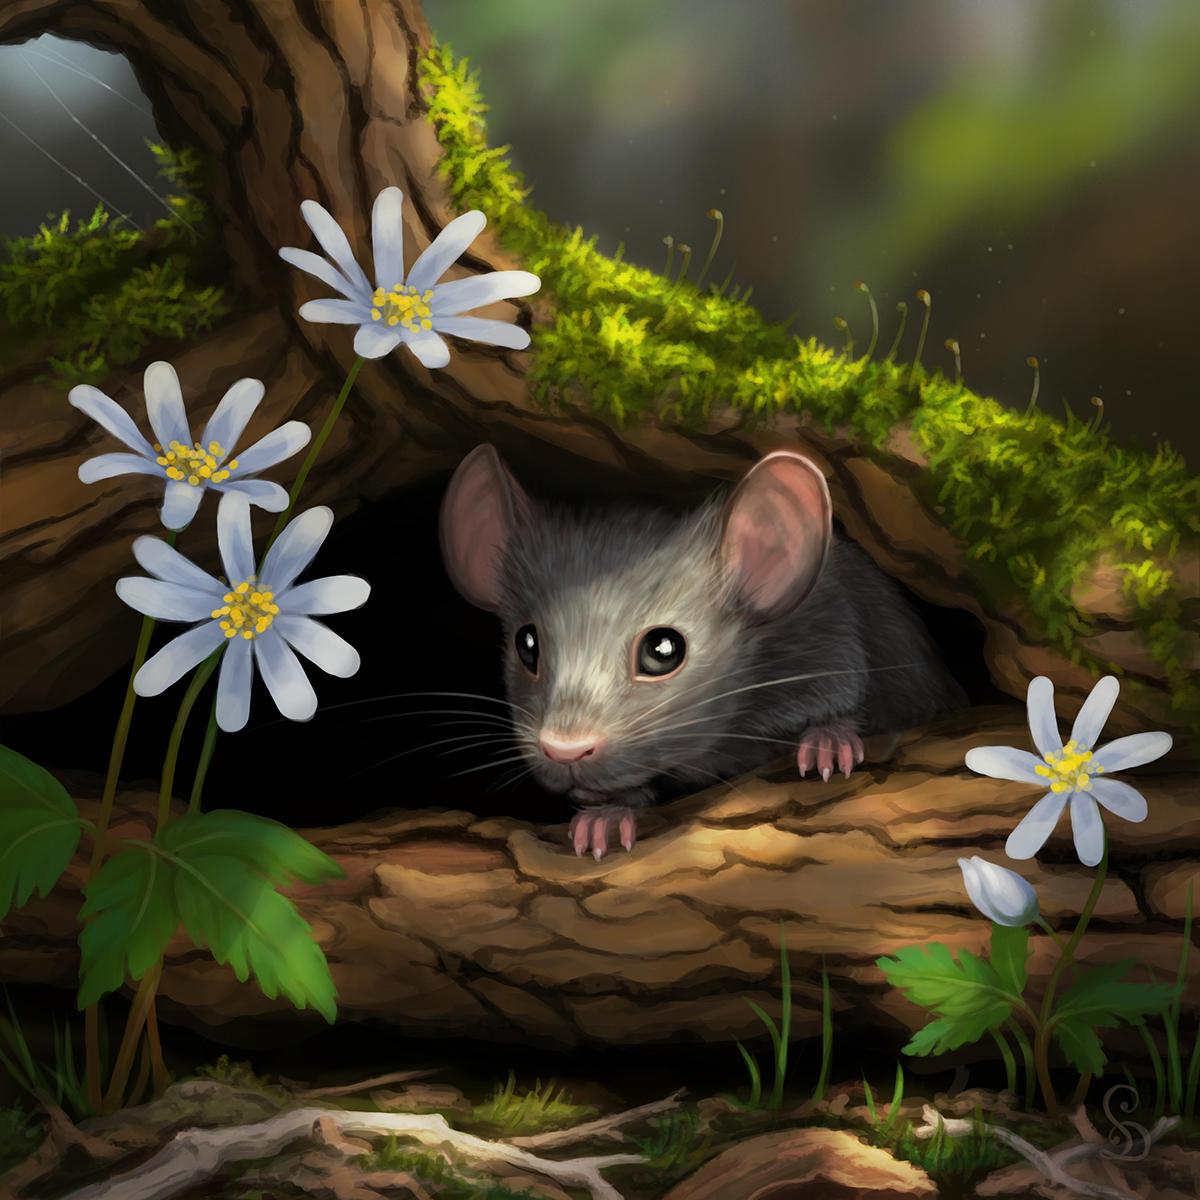 причина картинка красивого мышонка любом